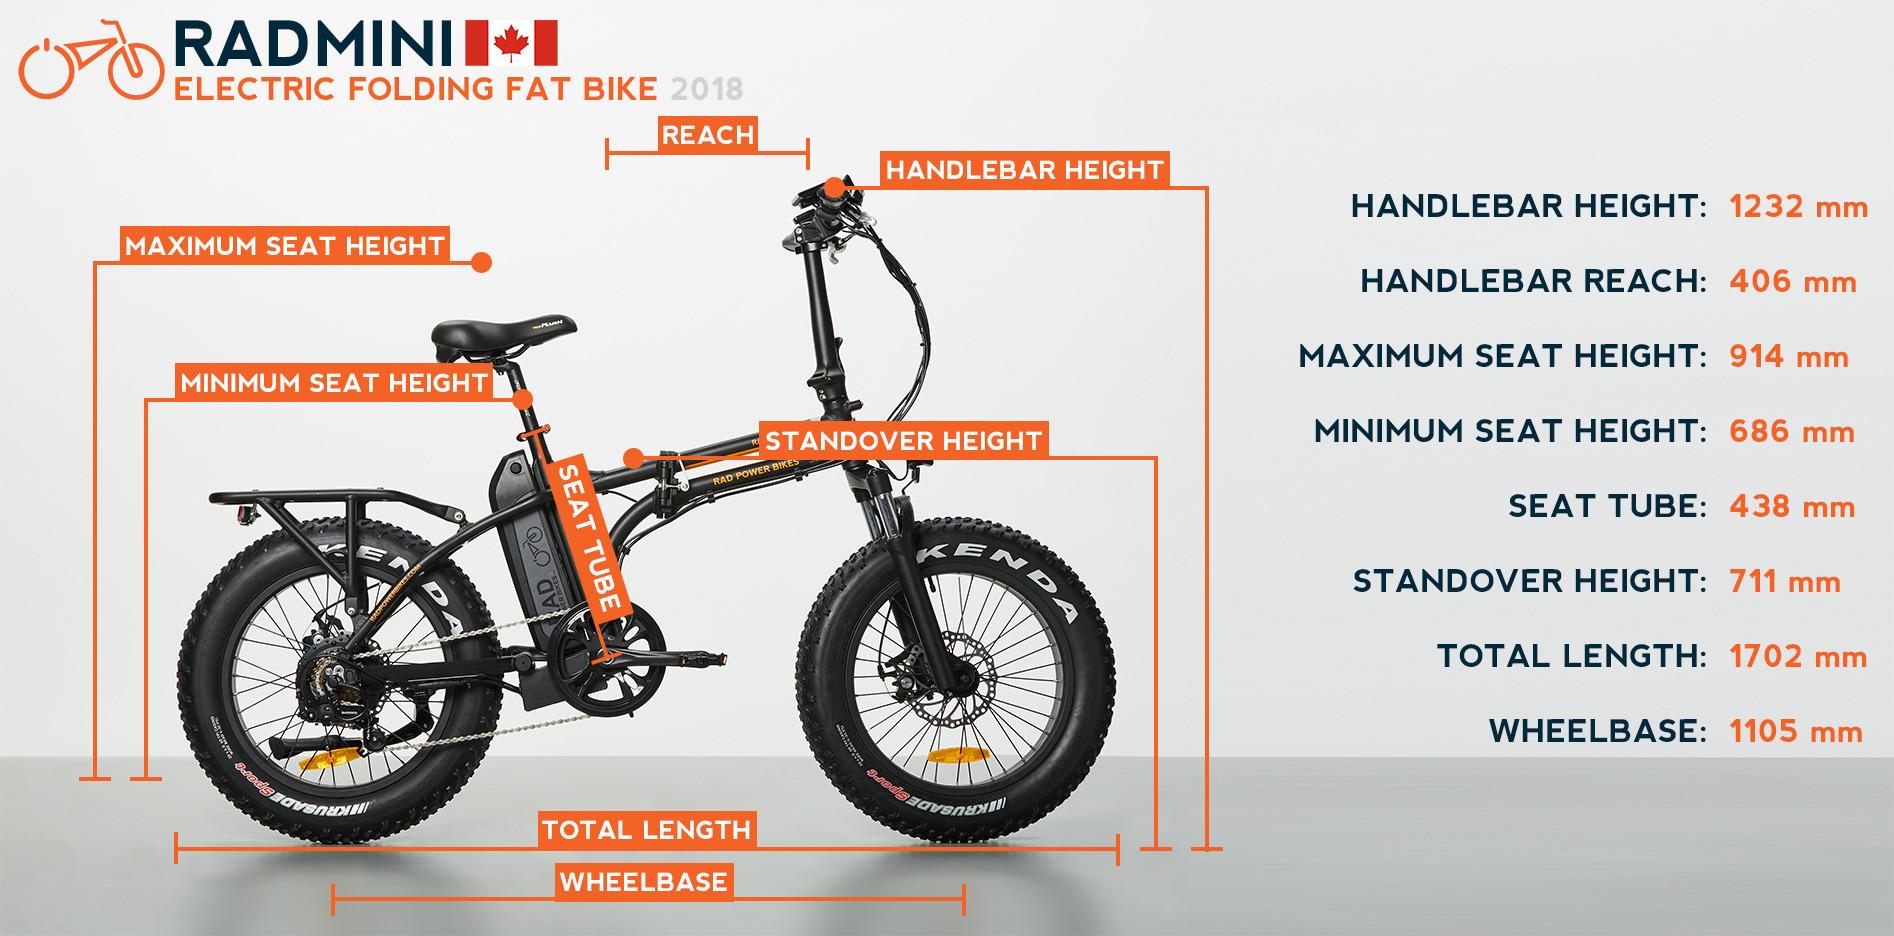 2018 Radmini Electric Folding Fat Bike Rad Power Bikes